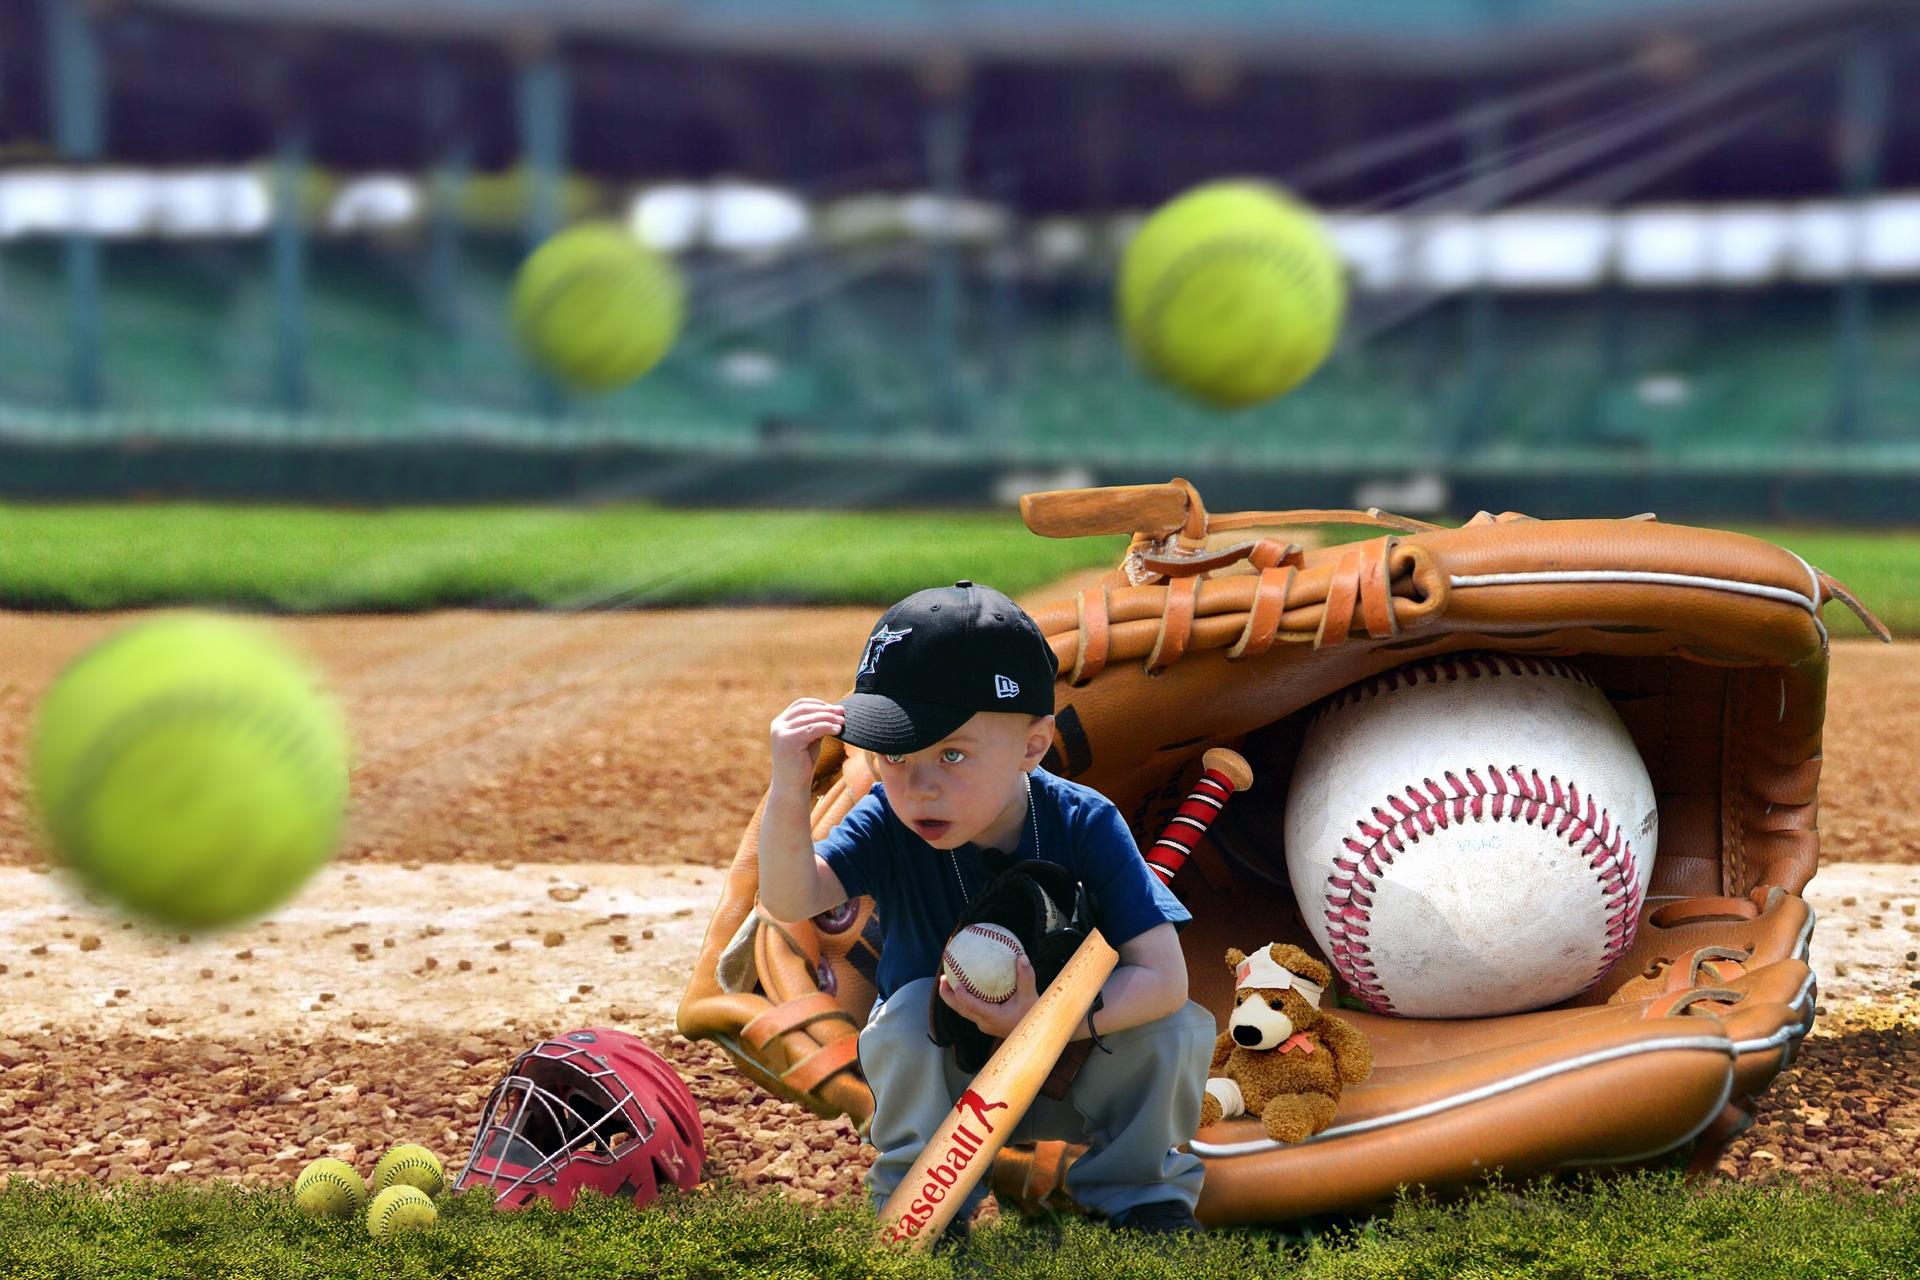 baseball-1462907_1920